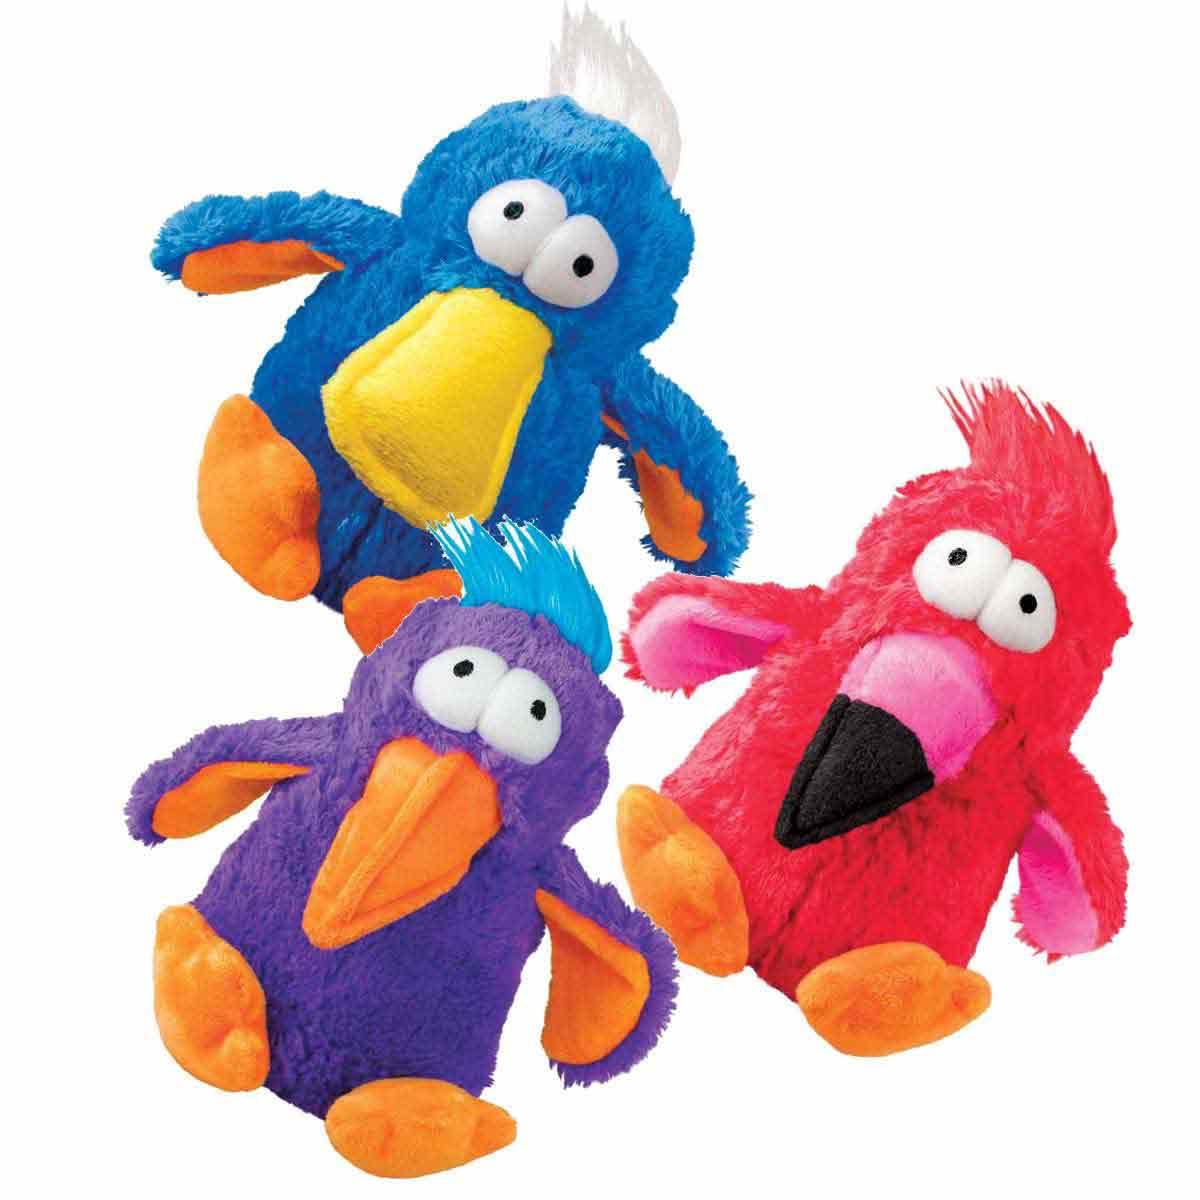 Medium Stuffed KONG Dodo Bird Dog Toy - Assorted Colors